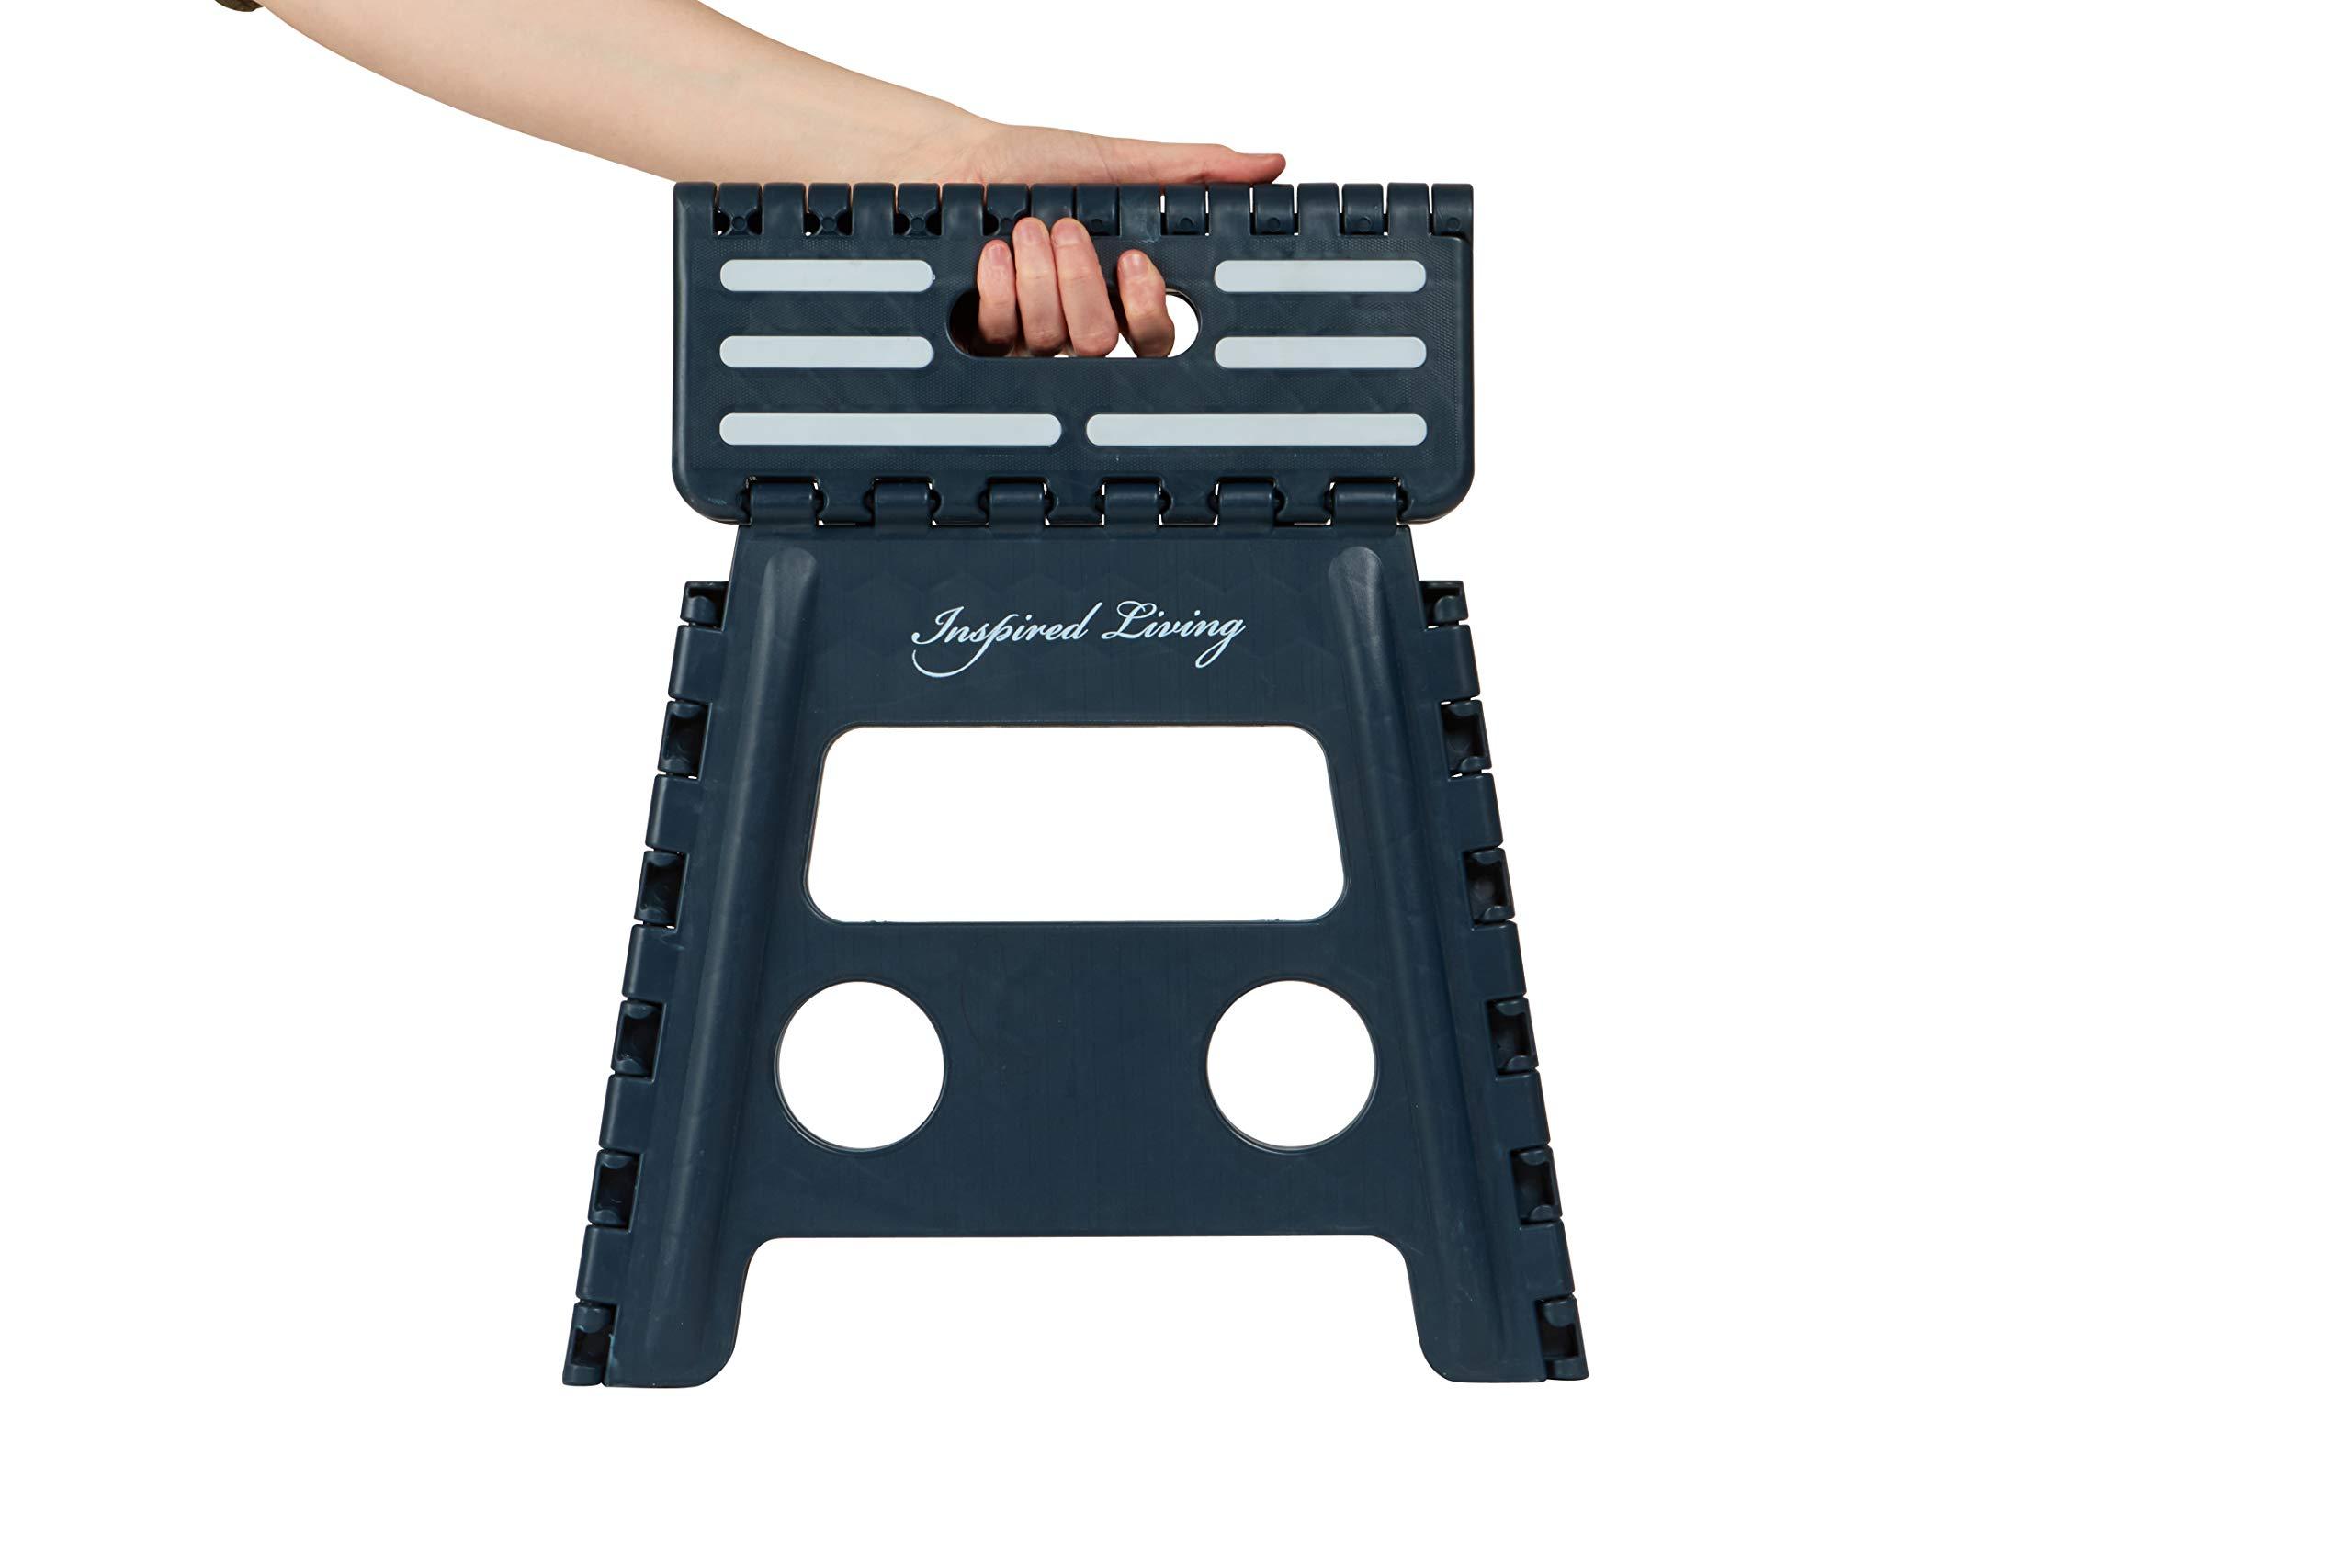 Inspired Living Folding Step Stool Heavy Duty, 13″ High, NAVY ONYX